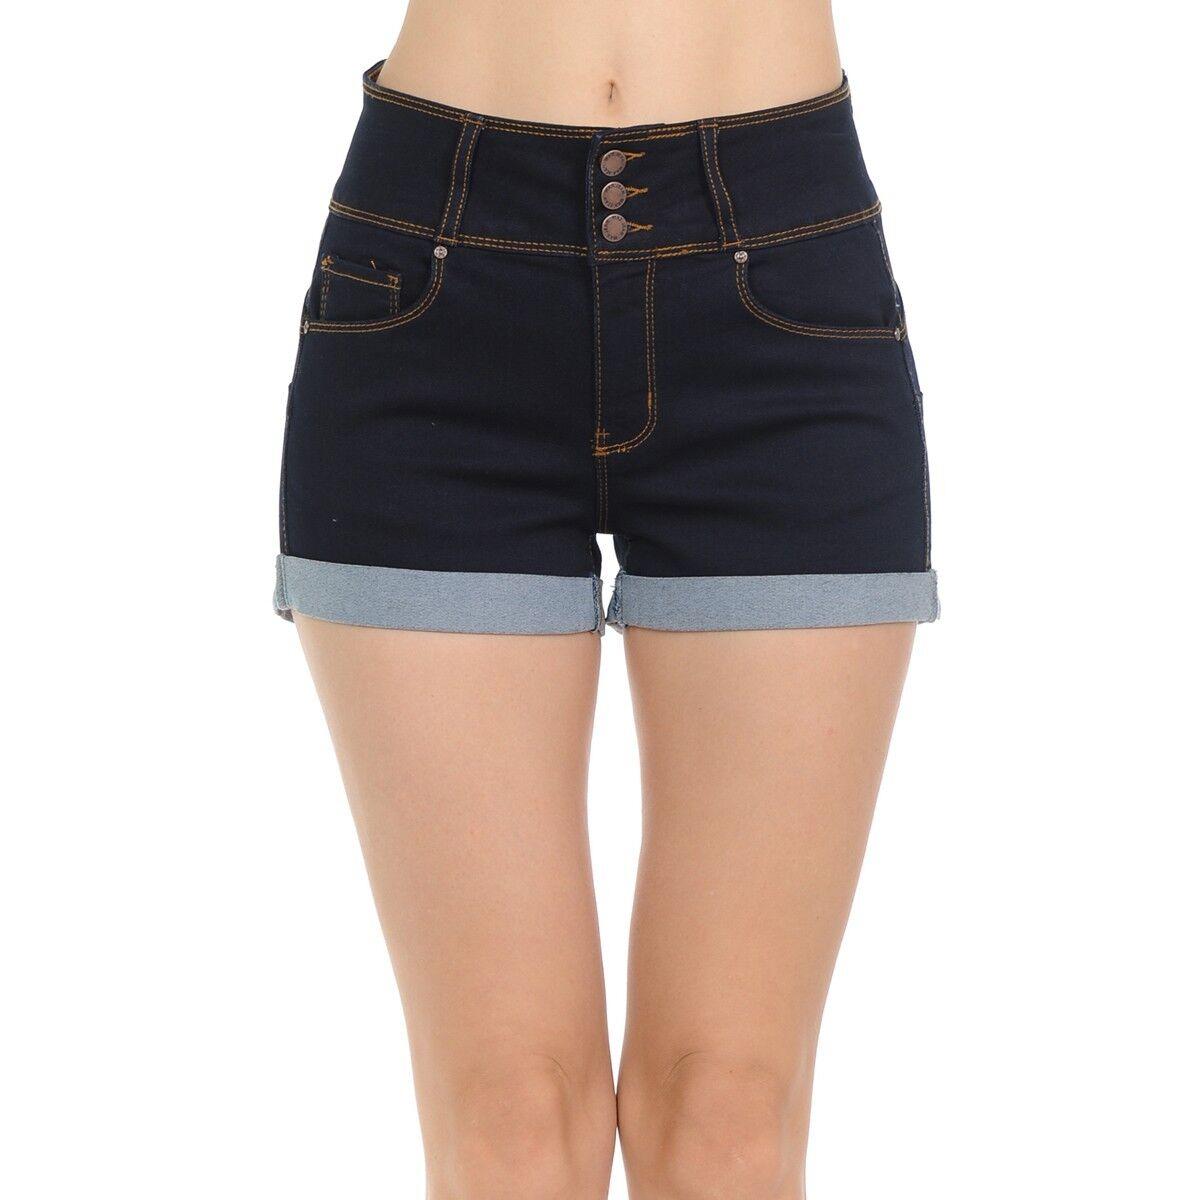 Wax Women's Juniors 3 Button Mid Rise Denim Shorts - Black,